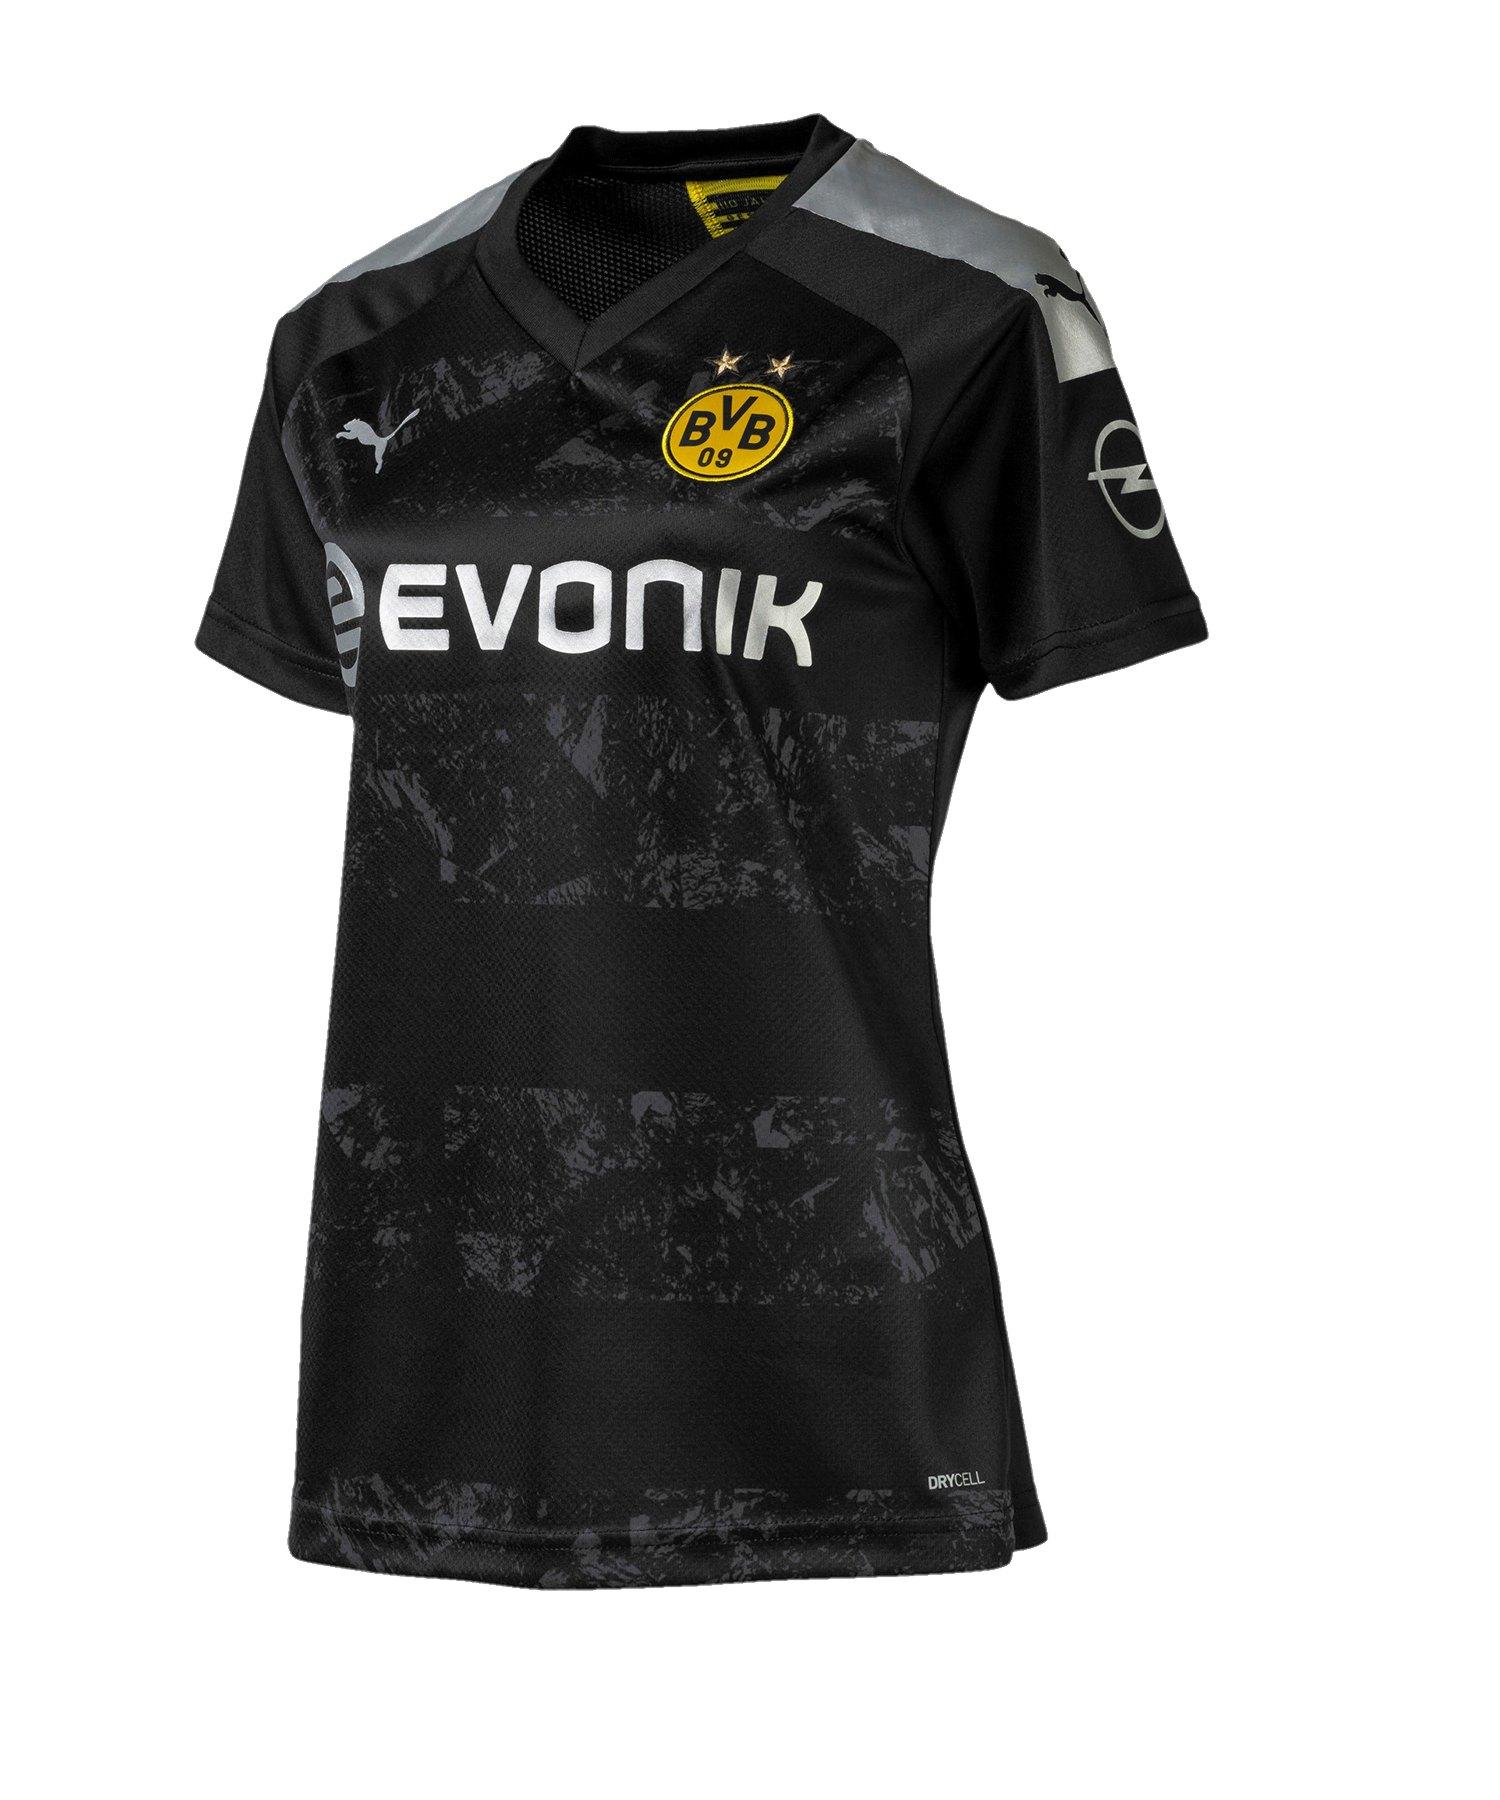 PUMA BVB Dortmund Trikot Away 2019/2020 Damen F12 - Schwarz